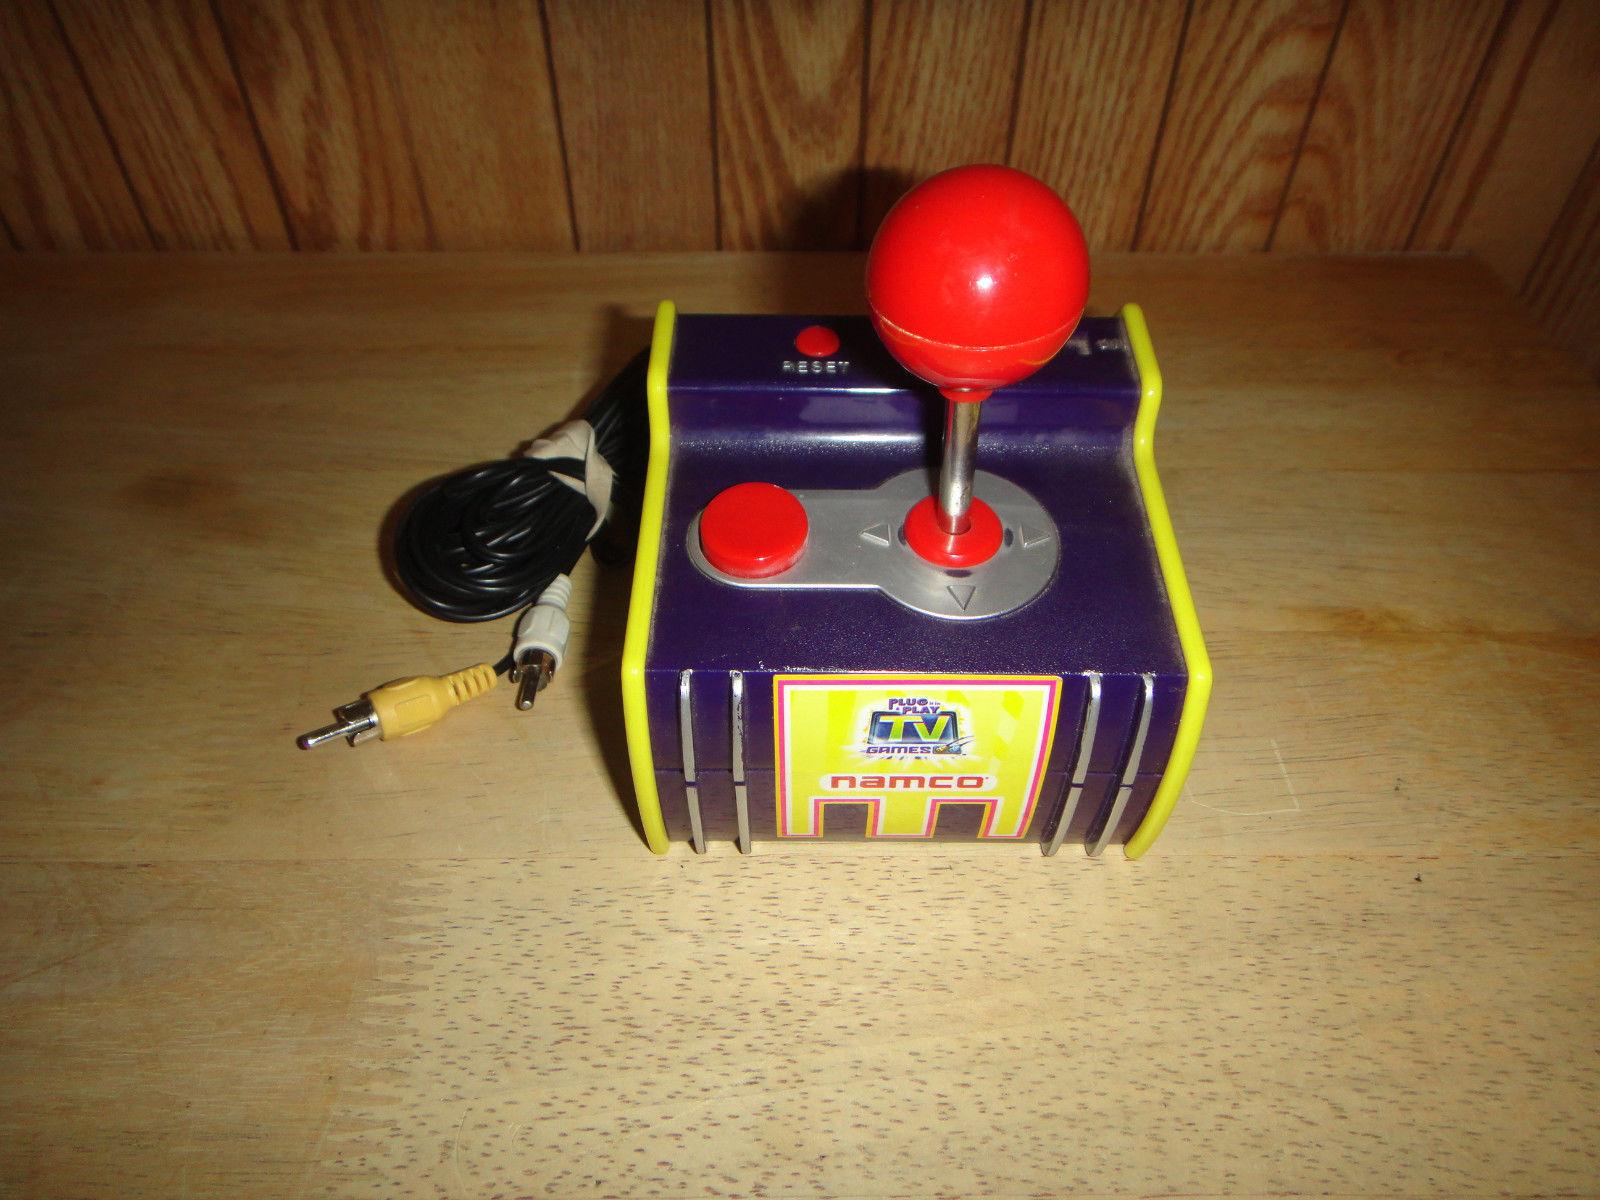 Tv Games Plug And Play : Jakks pacific pac man plug n play tv game namco bosconian